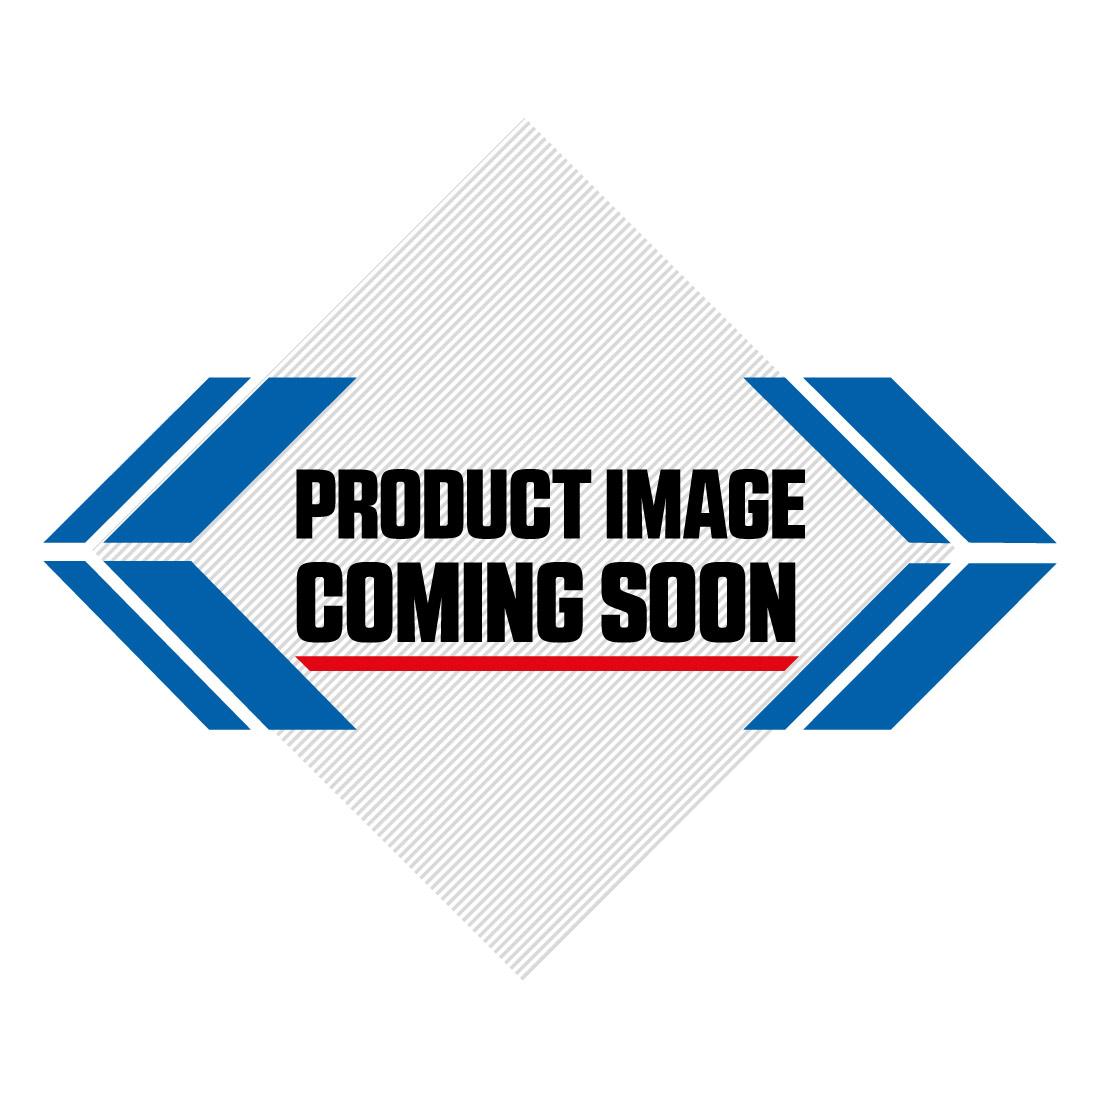 Honda Plastic Kit CRF 230 (08-14) OEM Factory Image-3>